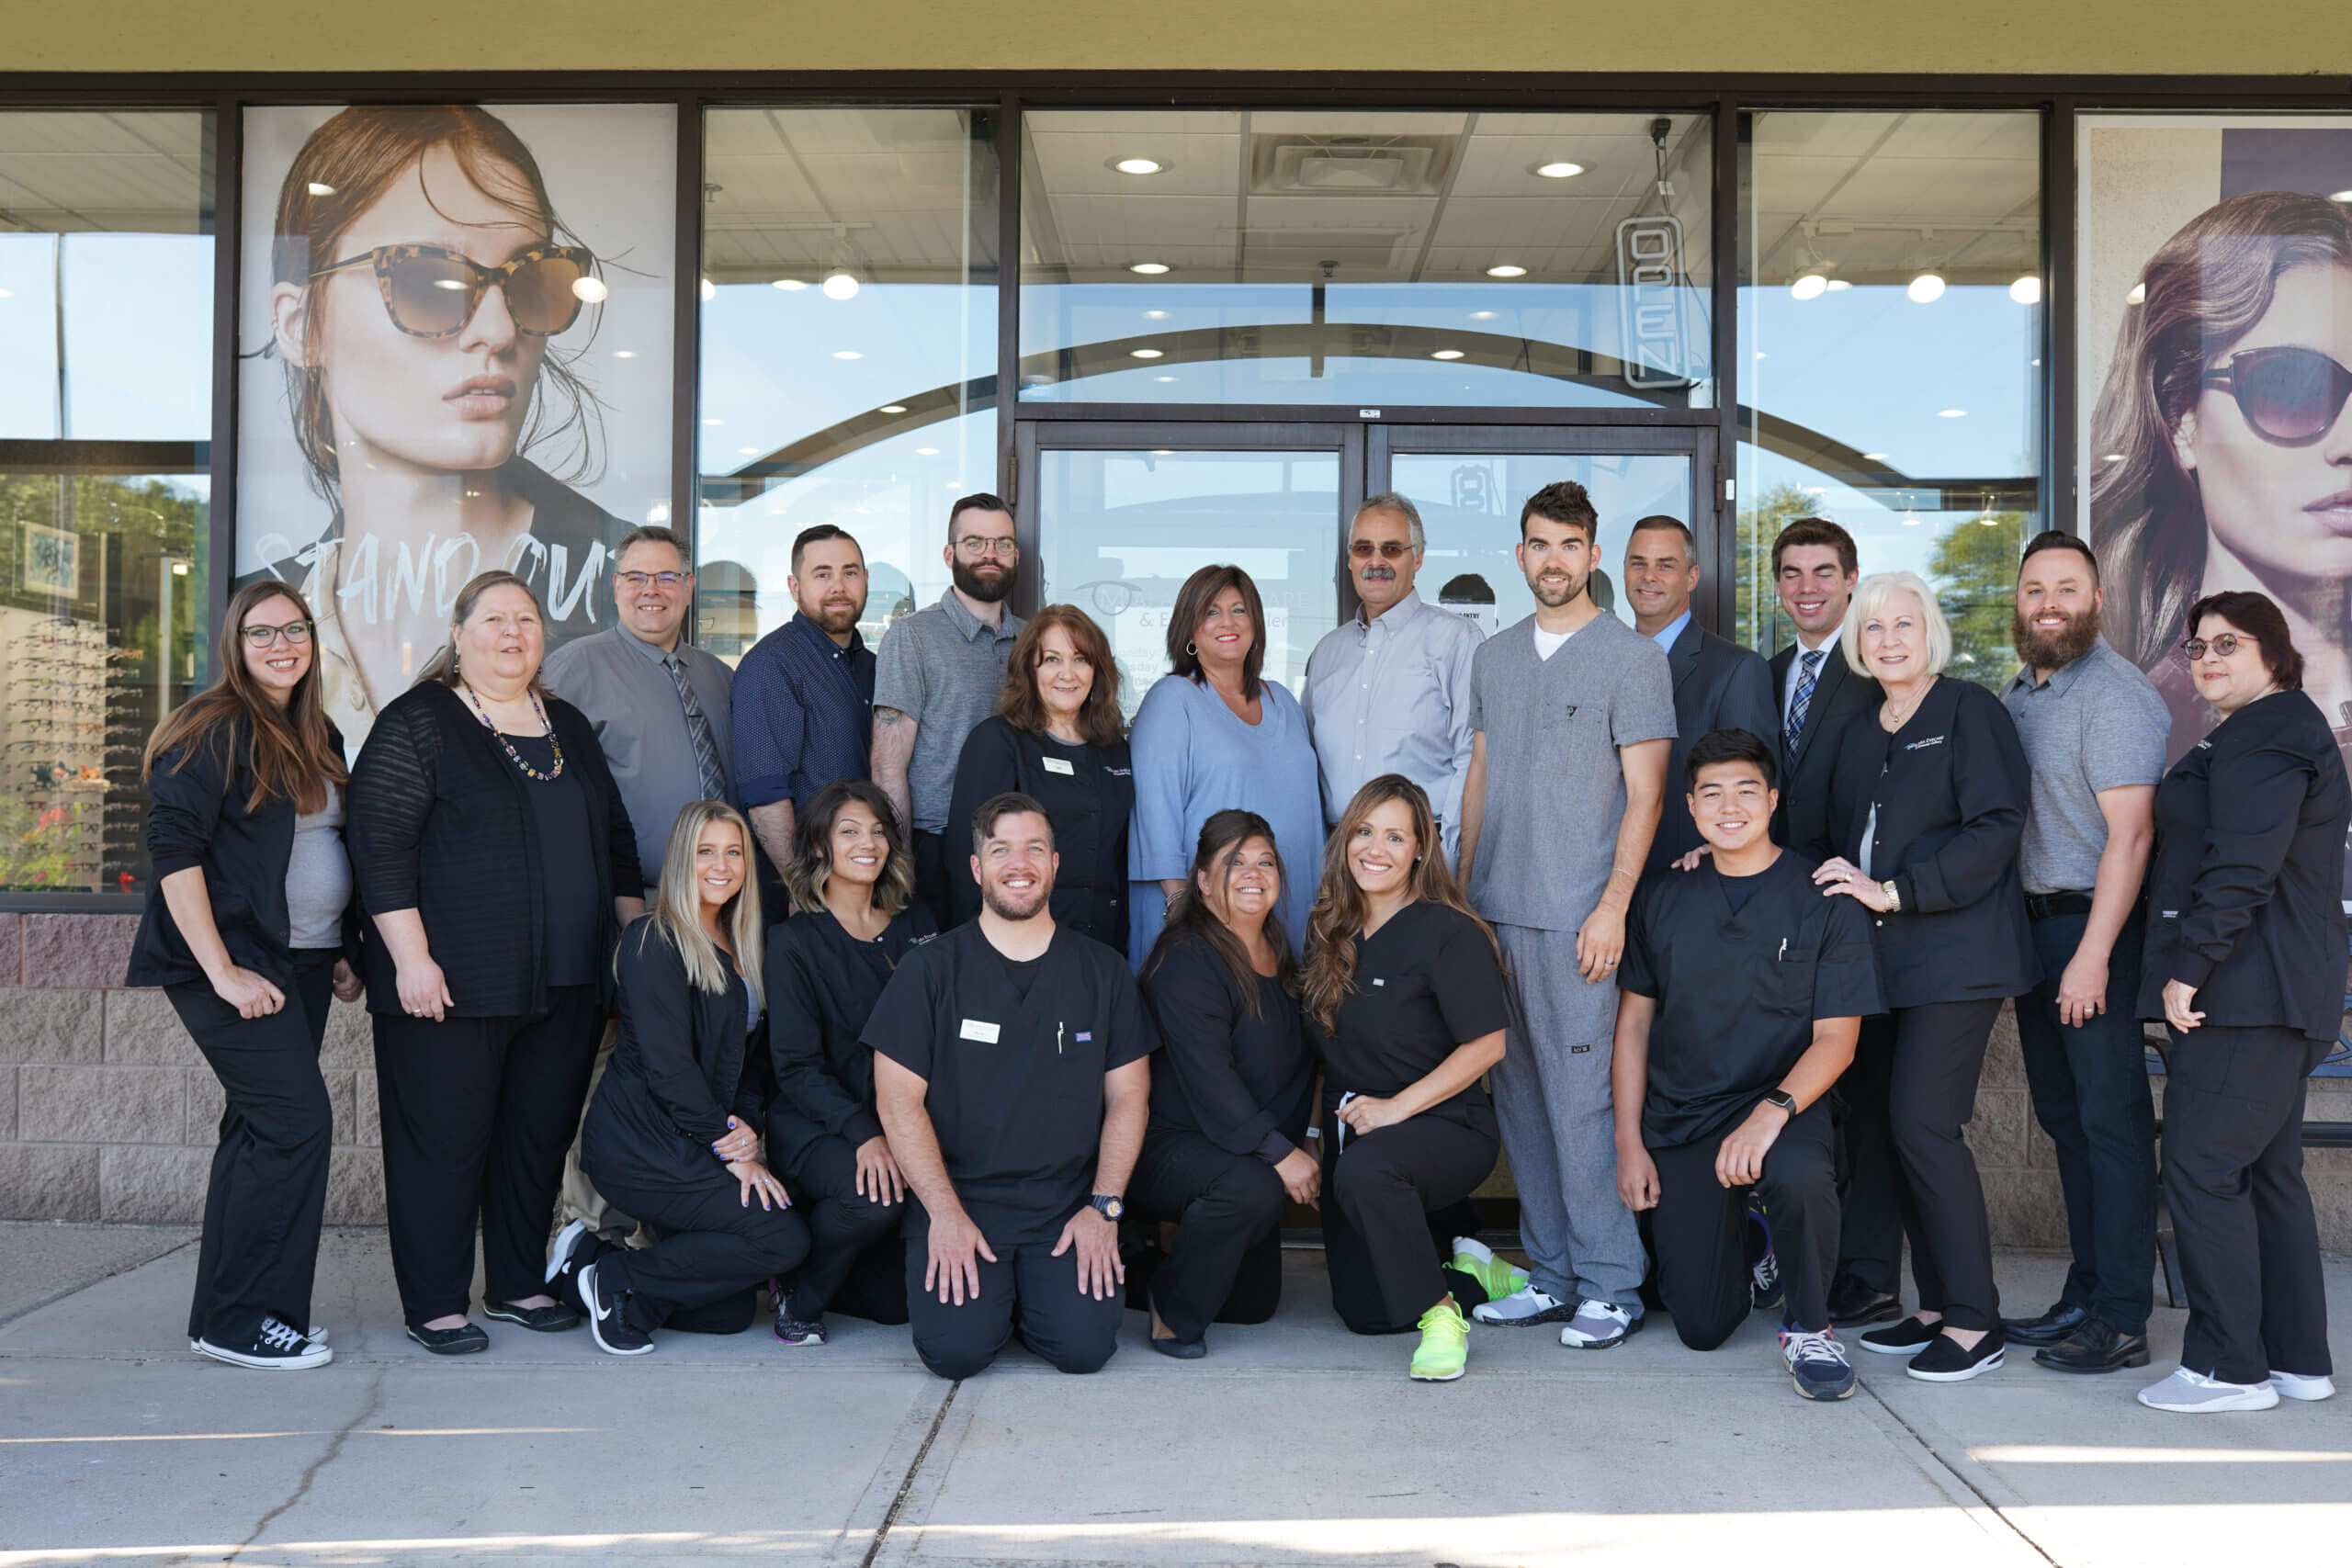 optometrist and staff at Malara Eyecare and Eyewear Gallery in Liverpool